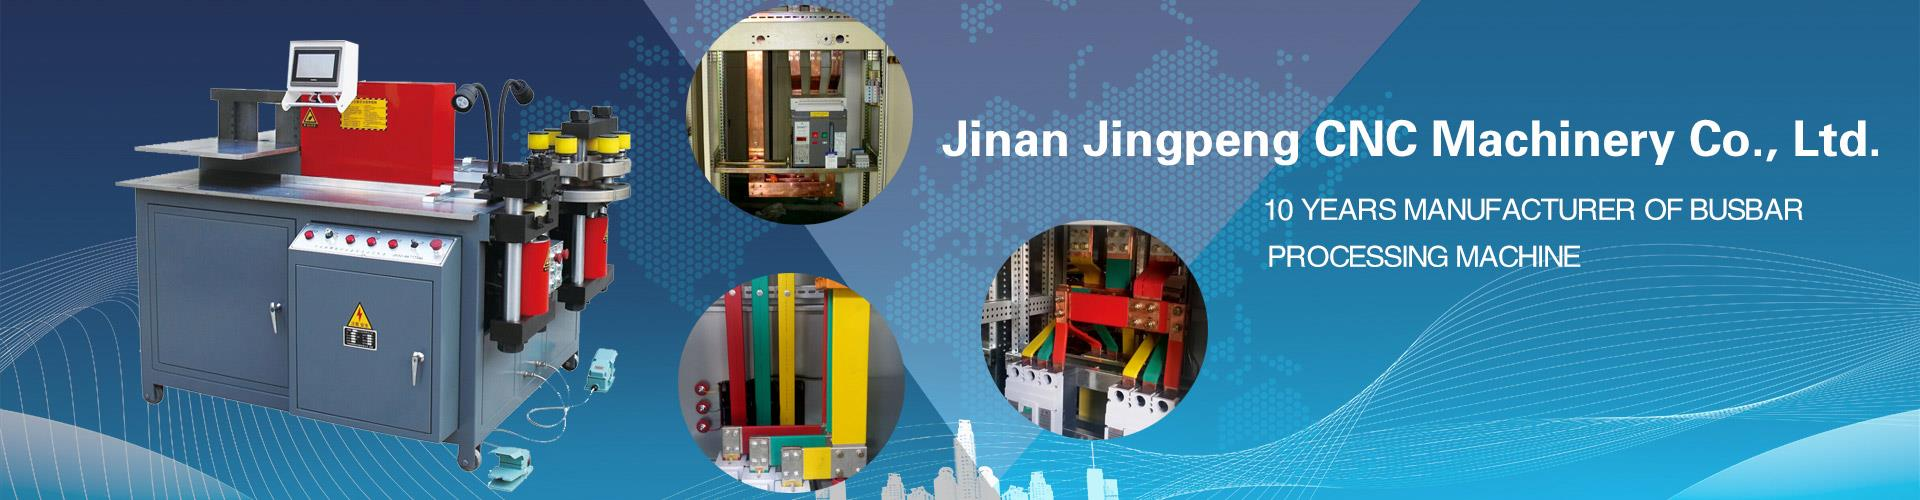 JINGPENG Banner 001